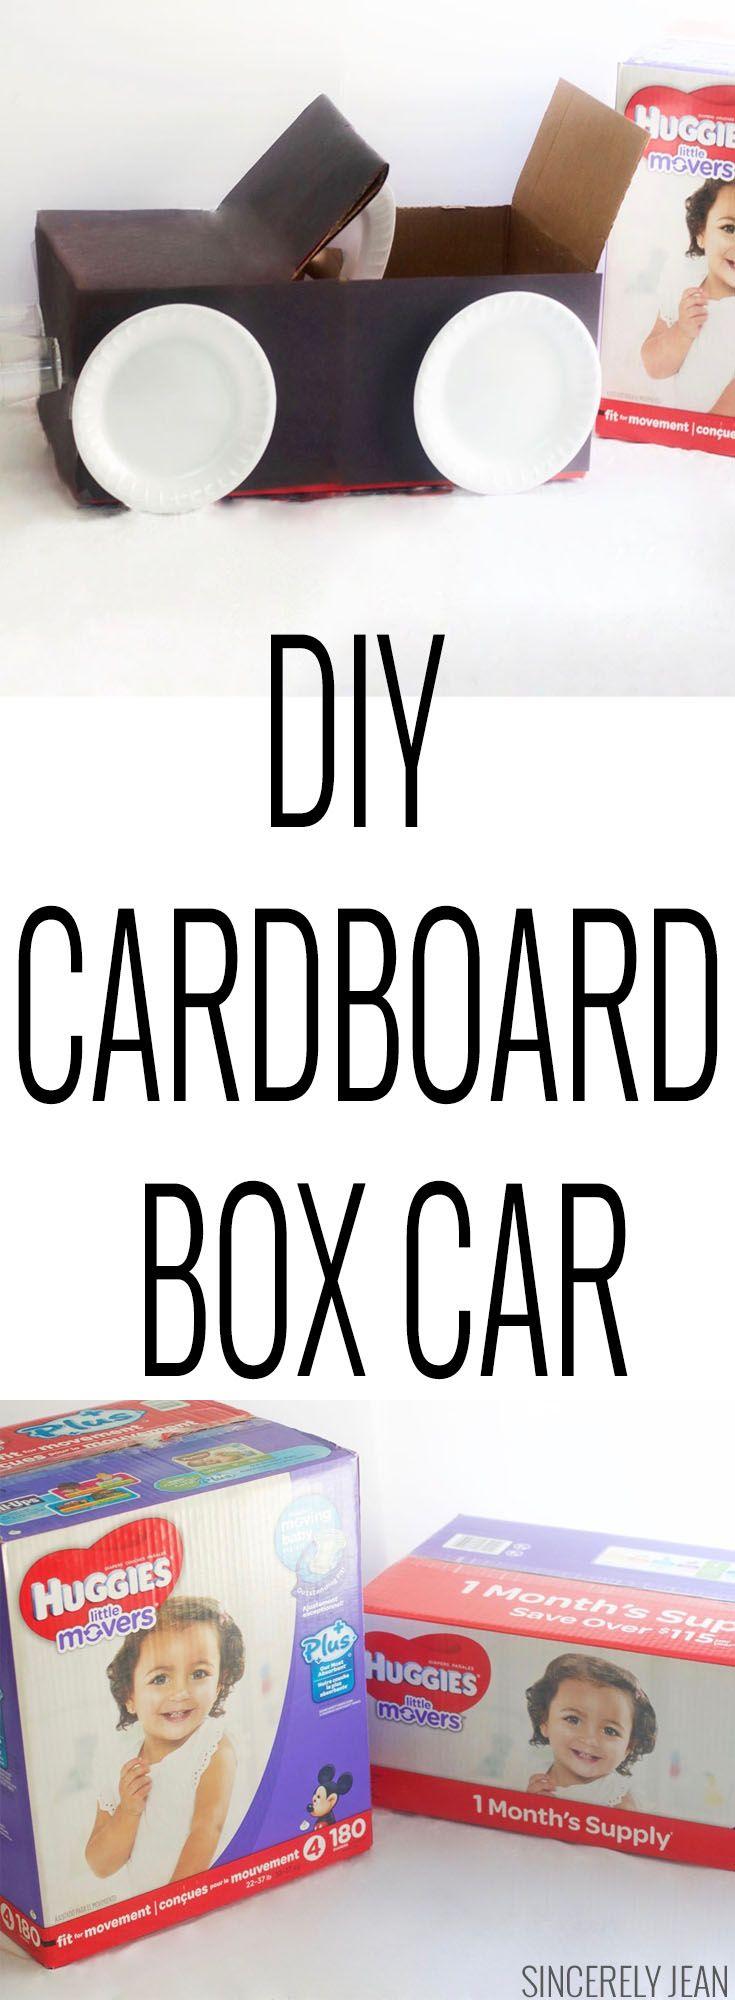 Diy cardboard box car with images cardboard box car